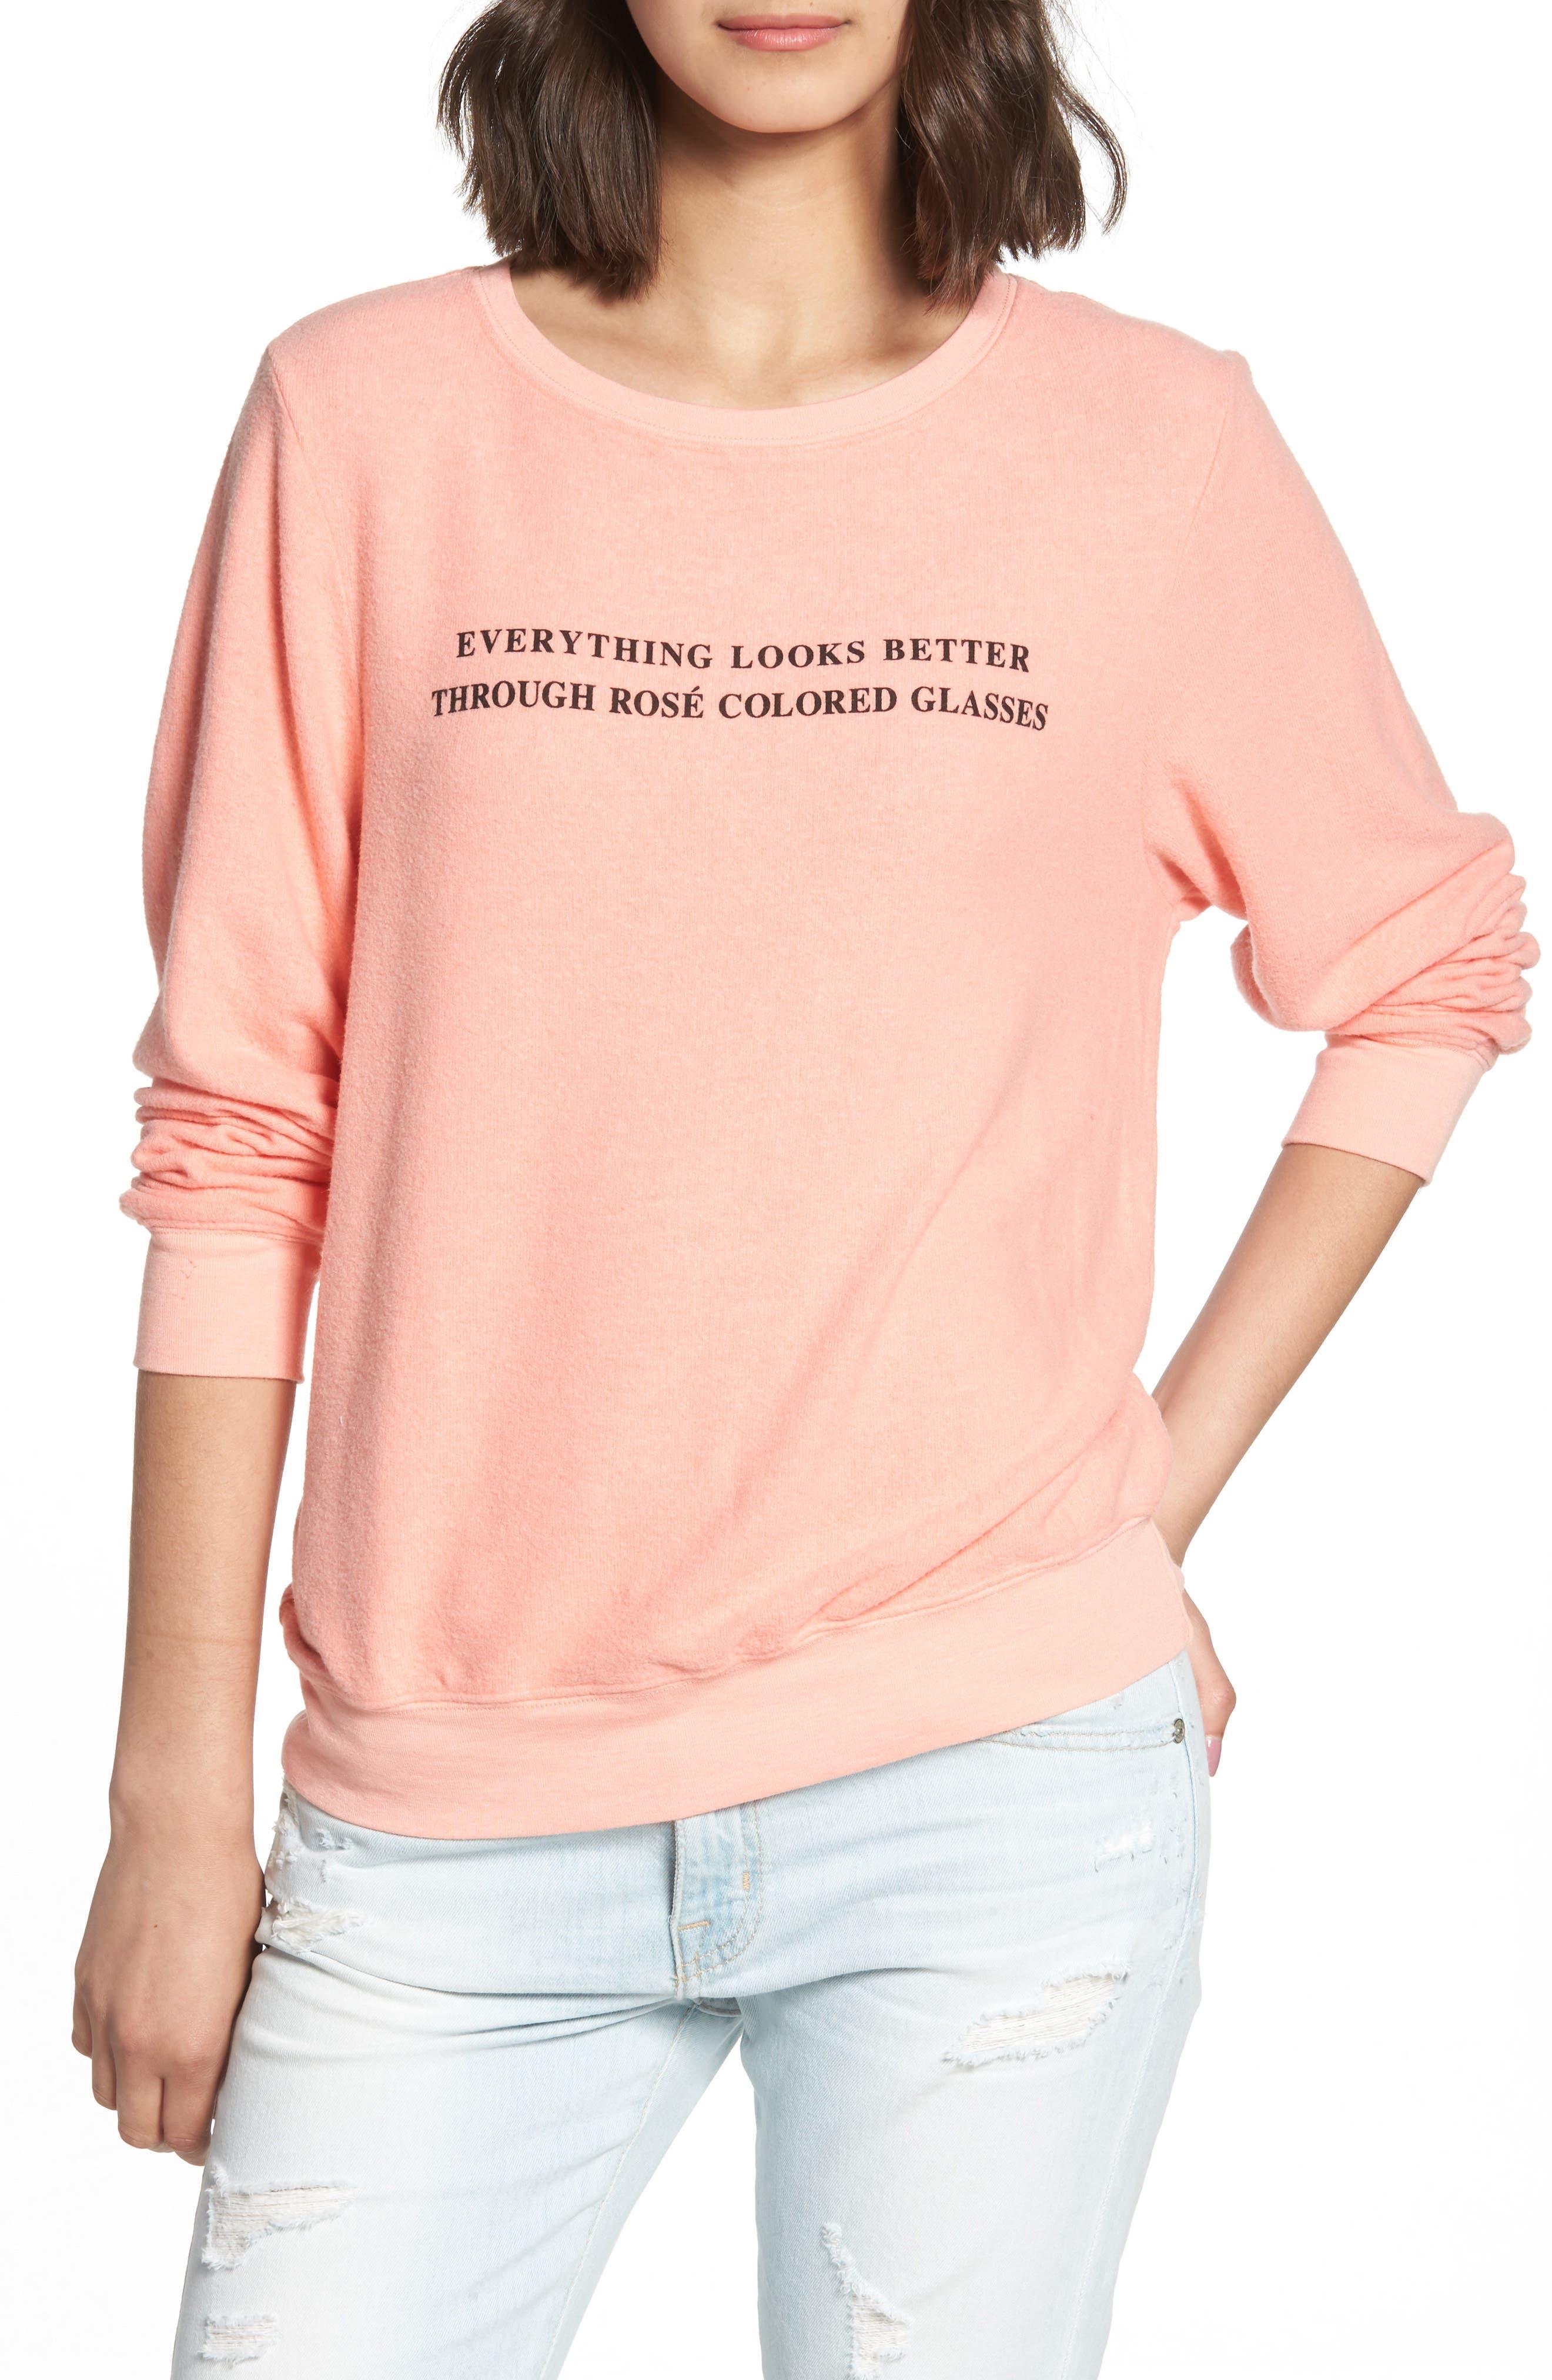 Rosé Glasses Beach Sweatshirt,                             Main thumbnail 1, color,                             950